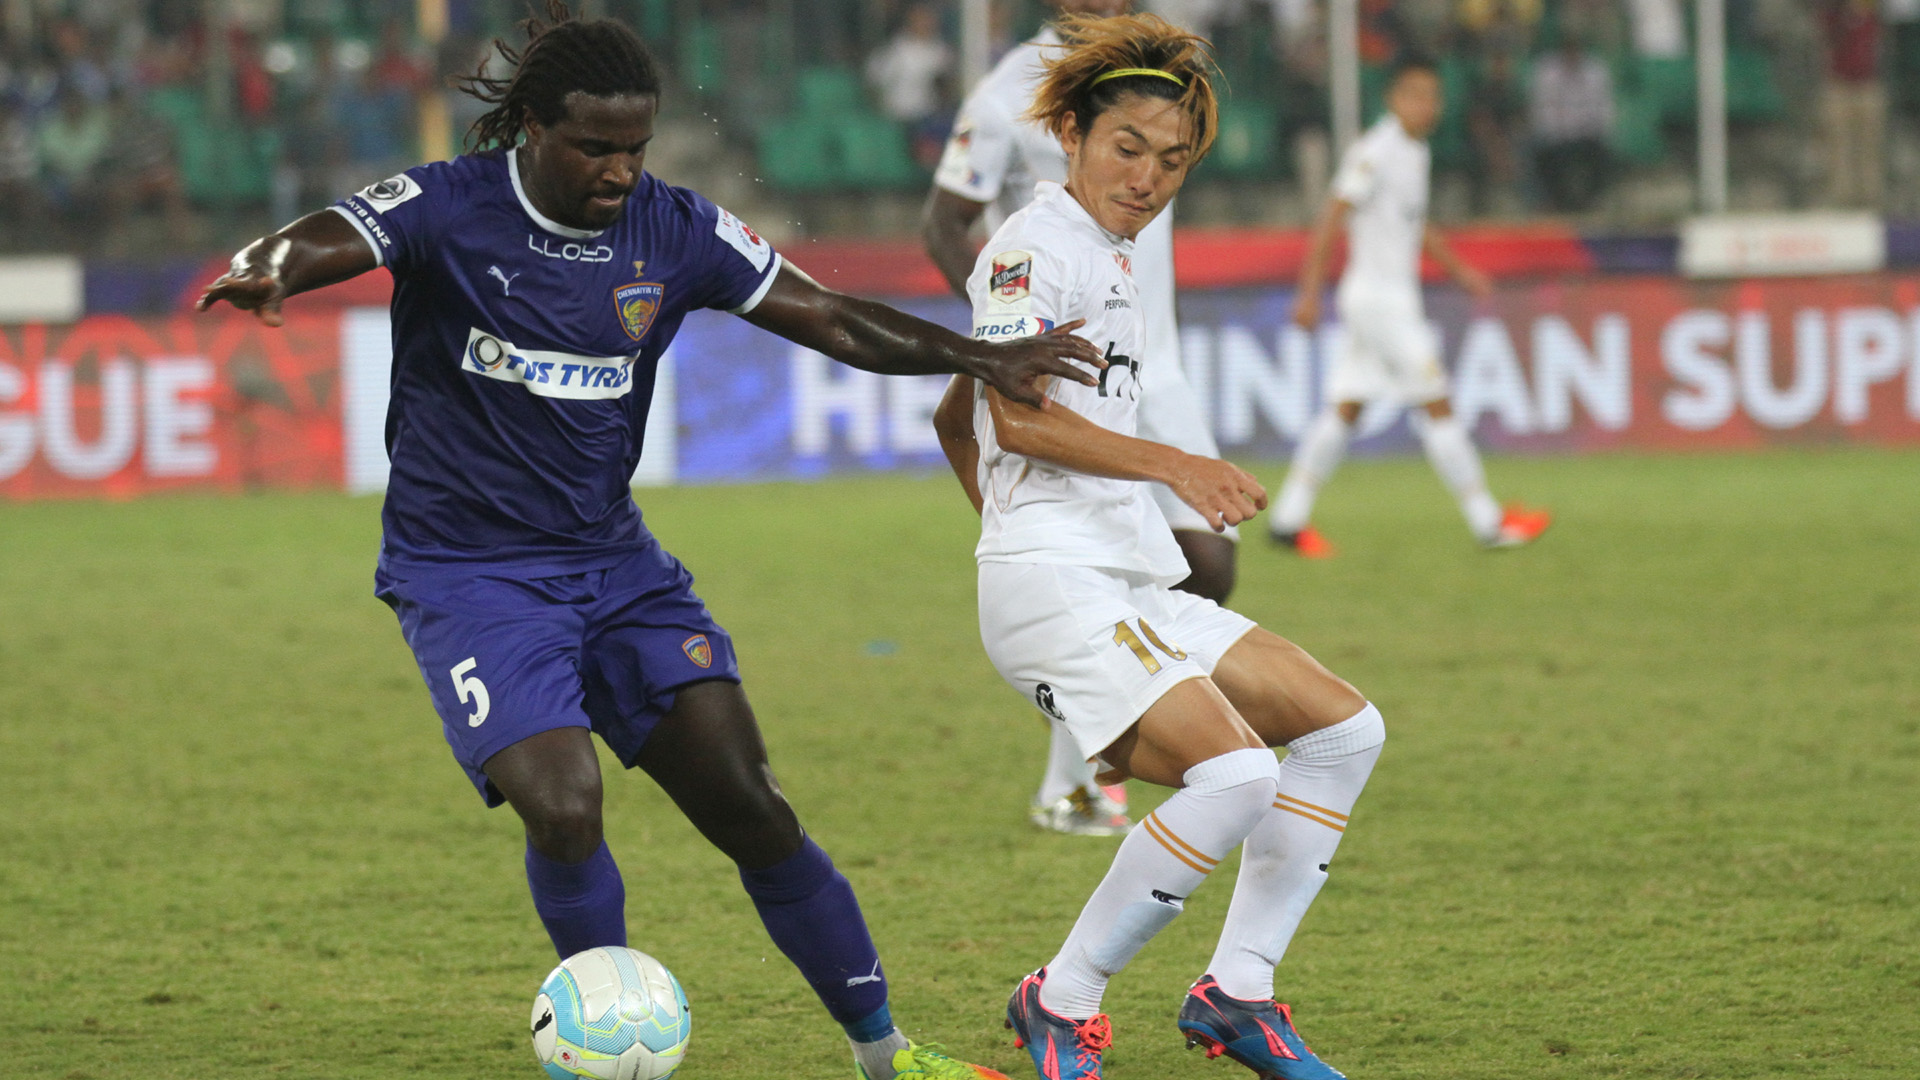 Bernard Mendy Katsumi Yusa Chennaiyin FC NorthEast United FC ISL season 3 2016